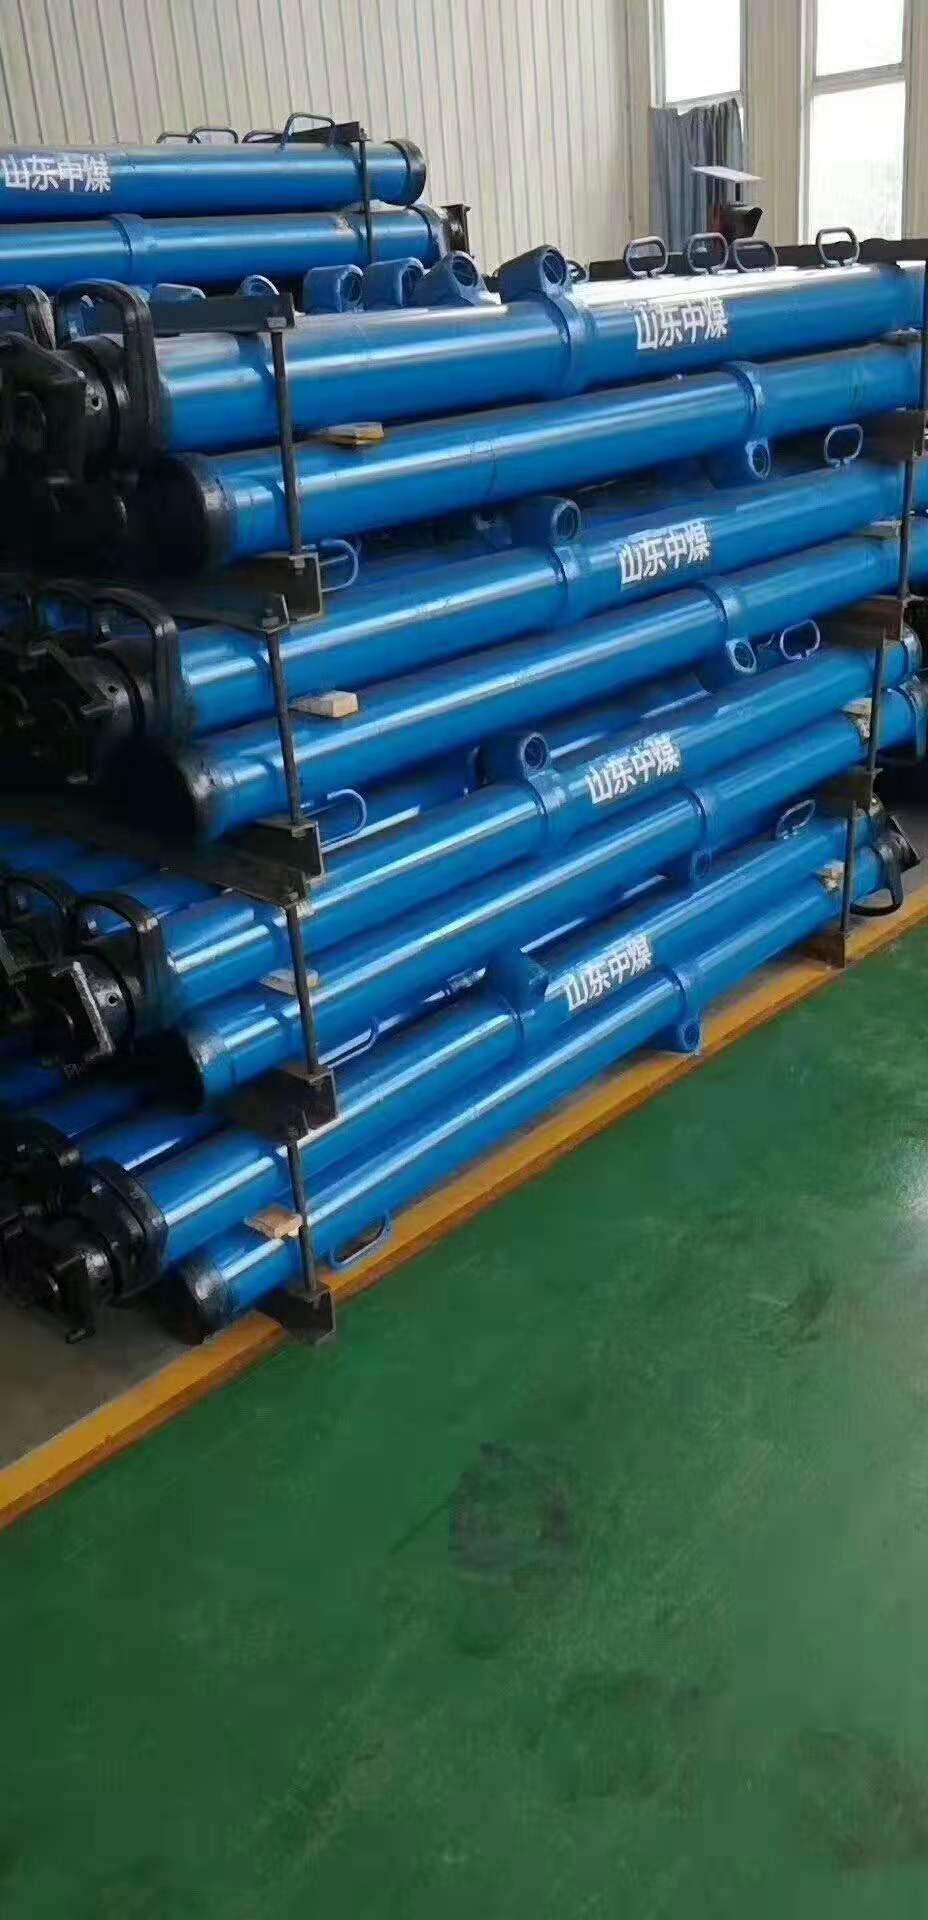 DW2.5米单体液压支柱适用范围